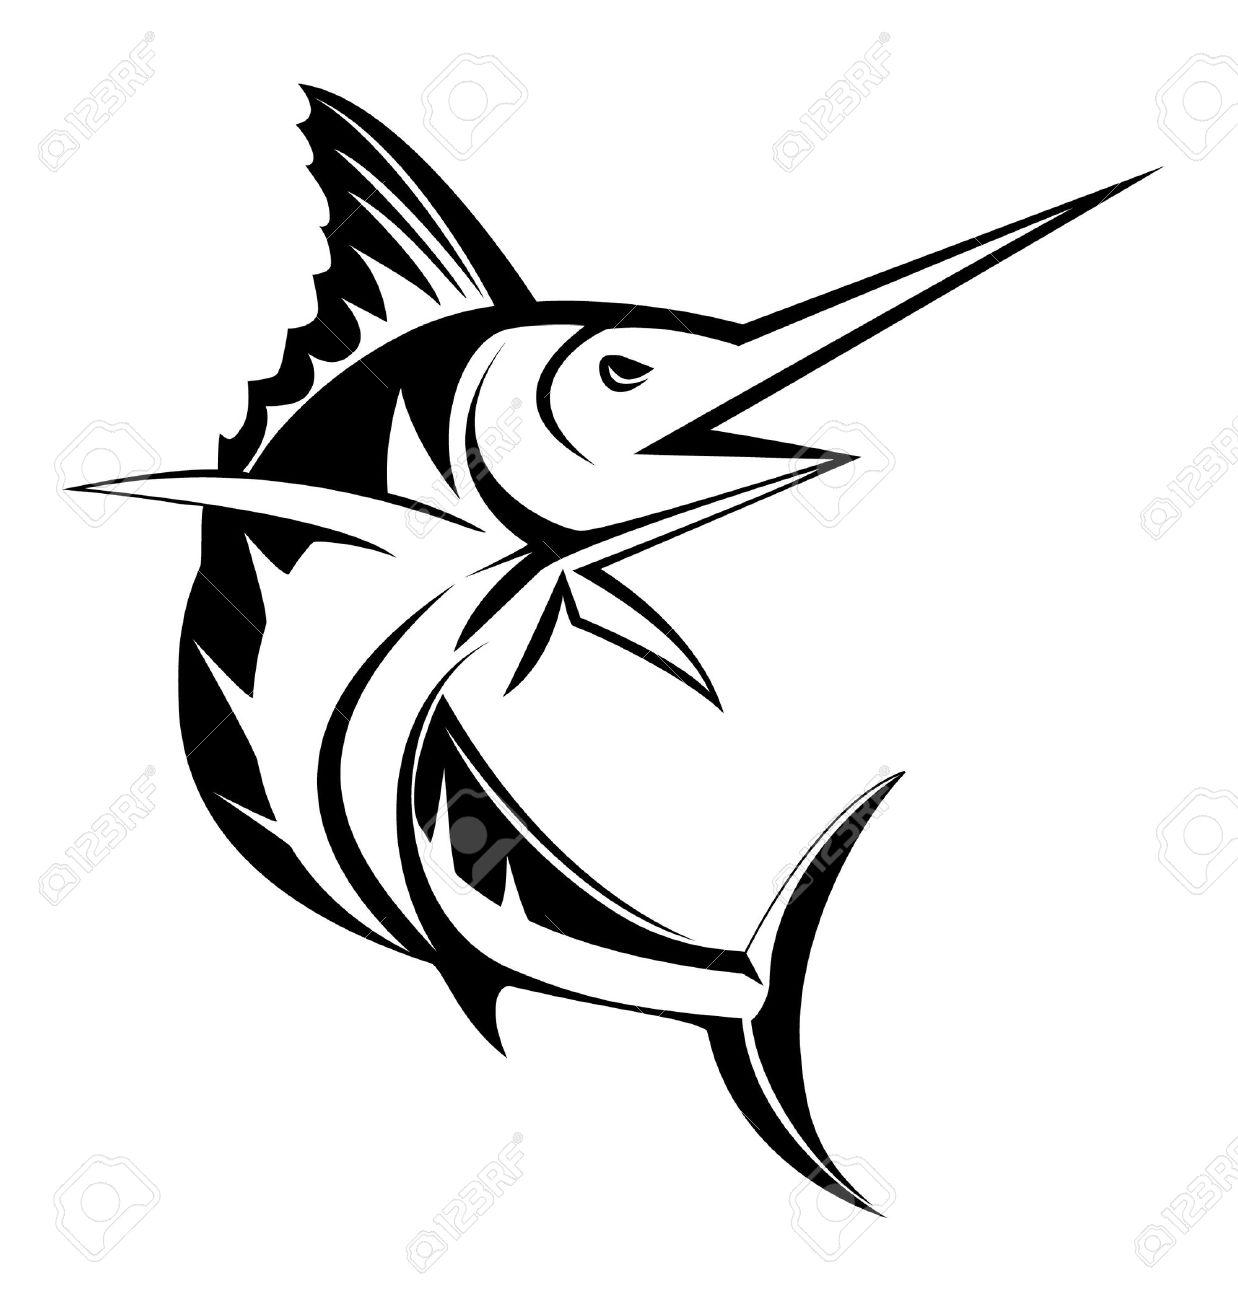 158 Marlin free clipart.